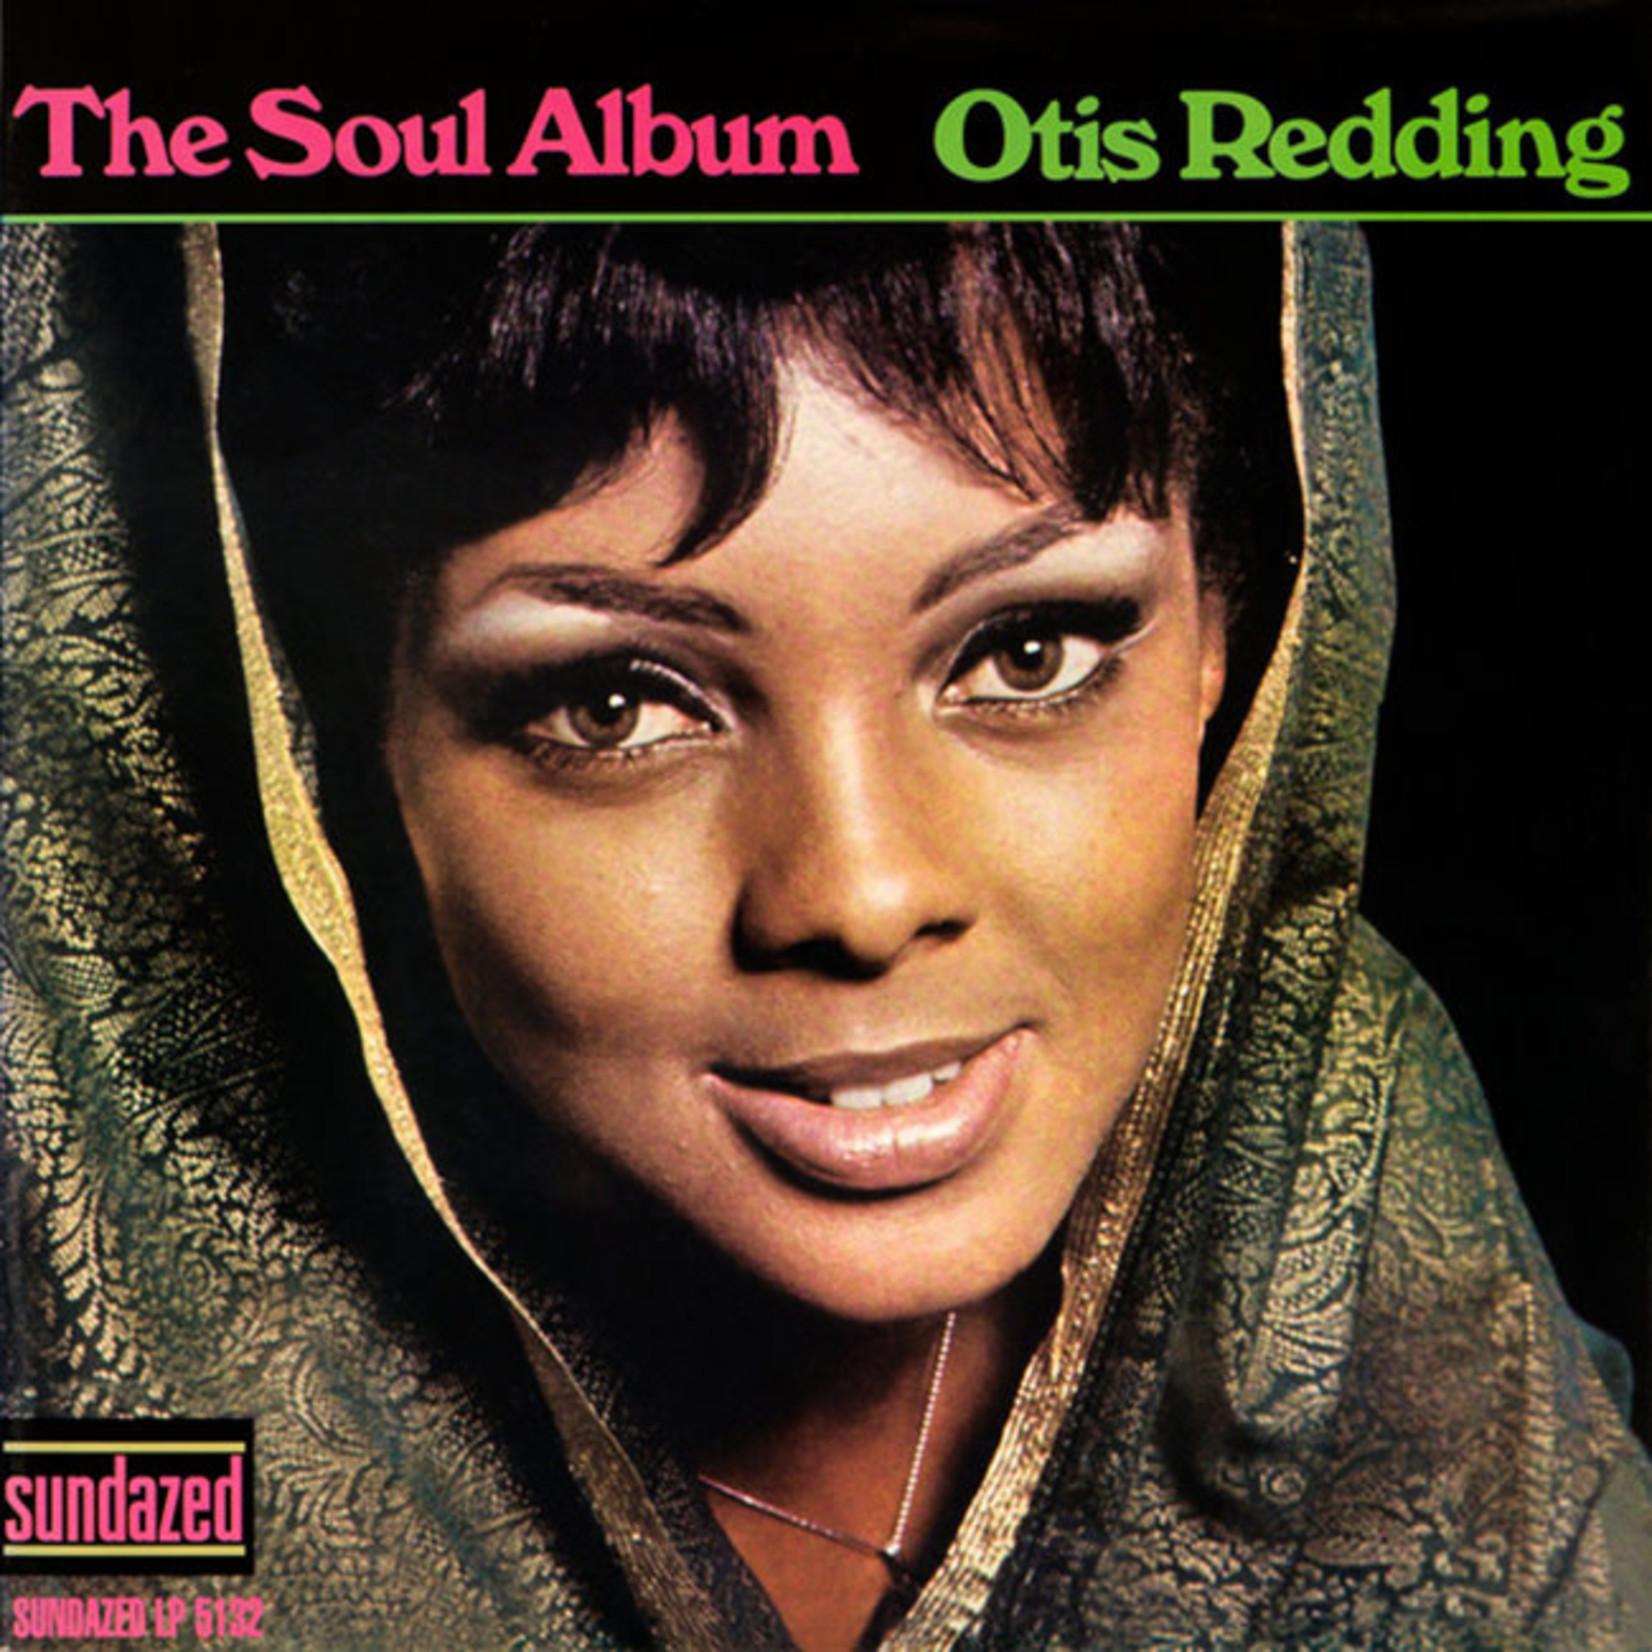 [New] Redding, Otis: The Soul Album